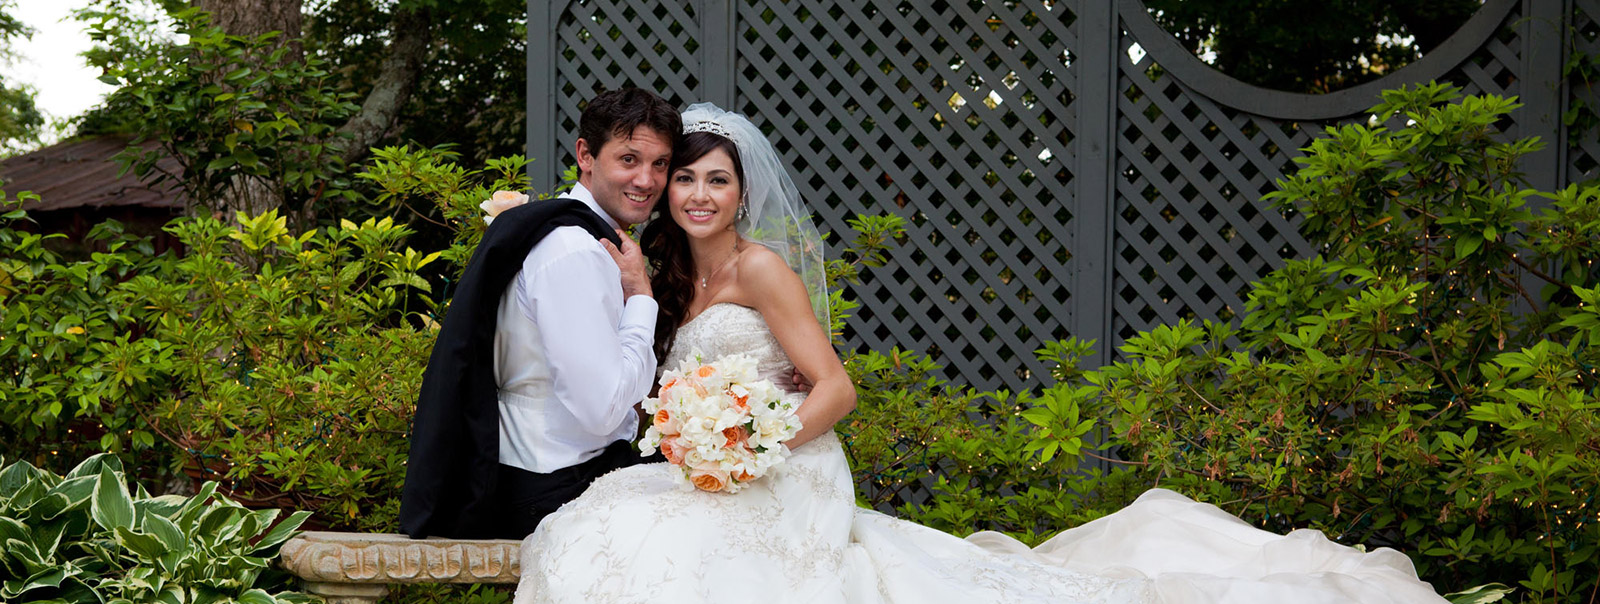 san diego outdoor wedding location